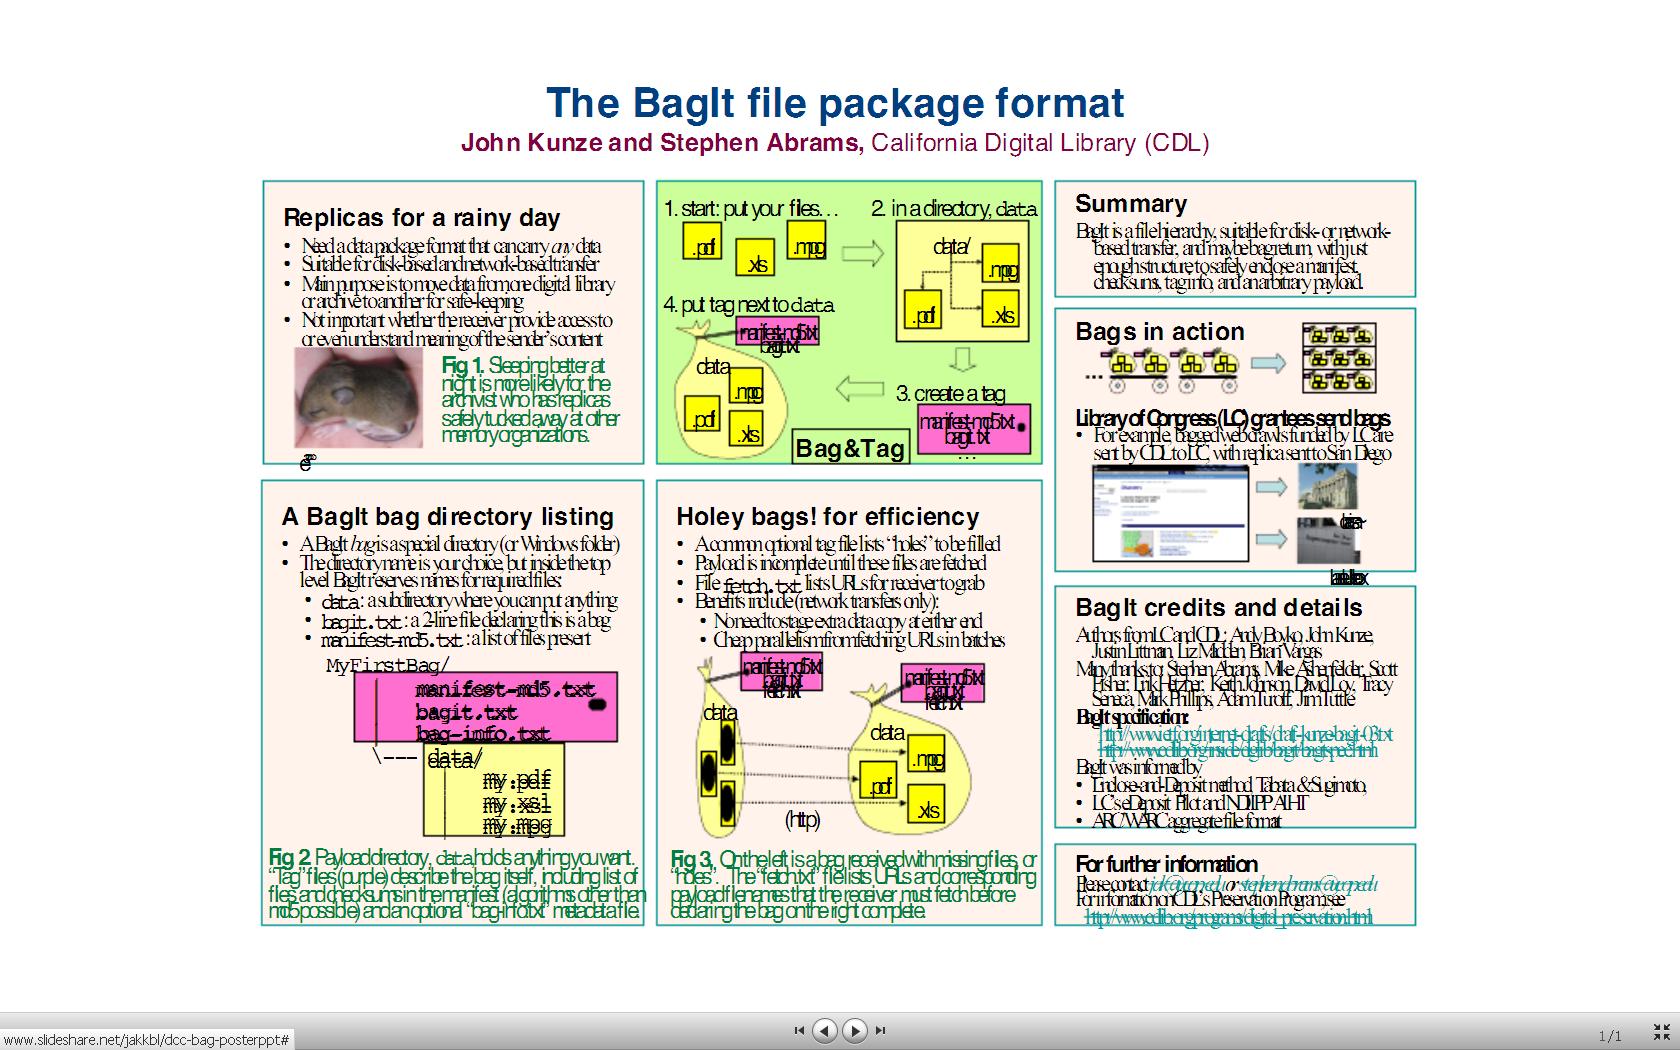 Figure 1: URL presented in Windows XP / Firefox